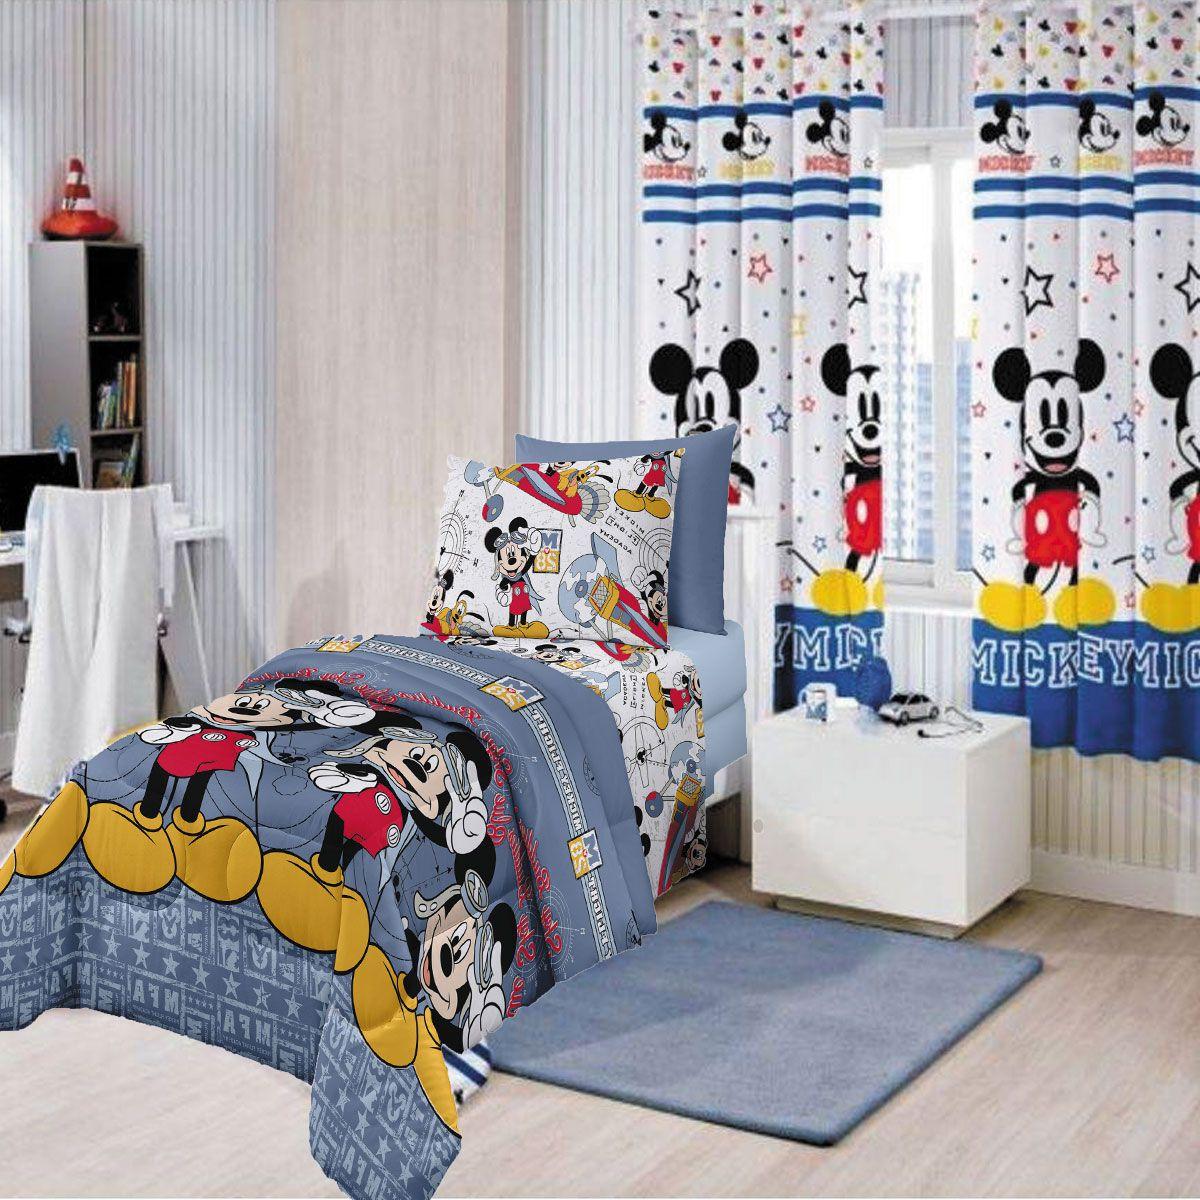 9110e2398a Kit Infantil Mickey Aviador Edredom + Jogo Cama + Cortina Santista ...